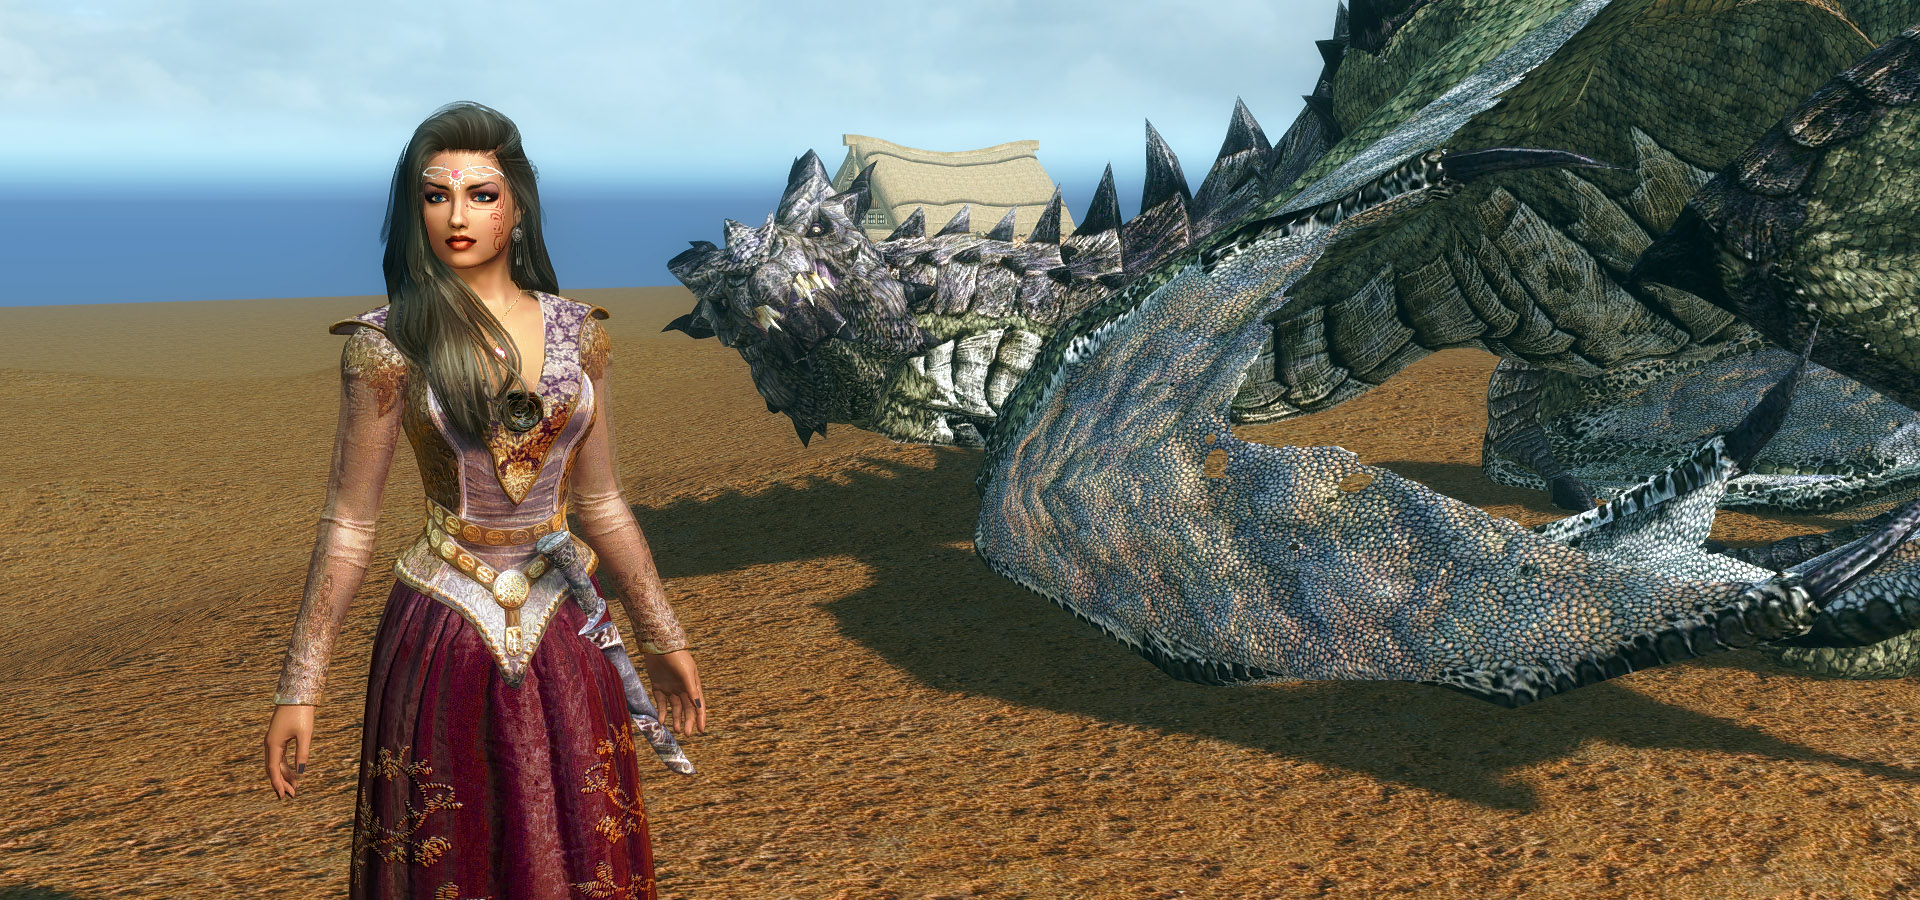 557. Одна из локаций Мирака.jpg - Elder Scrolls 5: Skyrim, the CBBE, Сборка-21